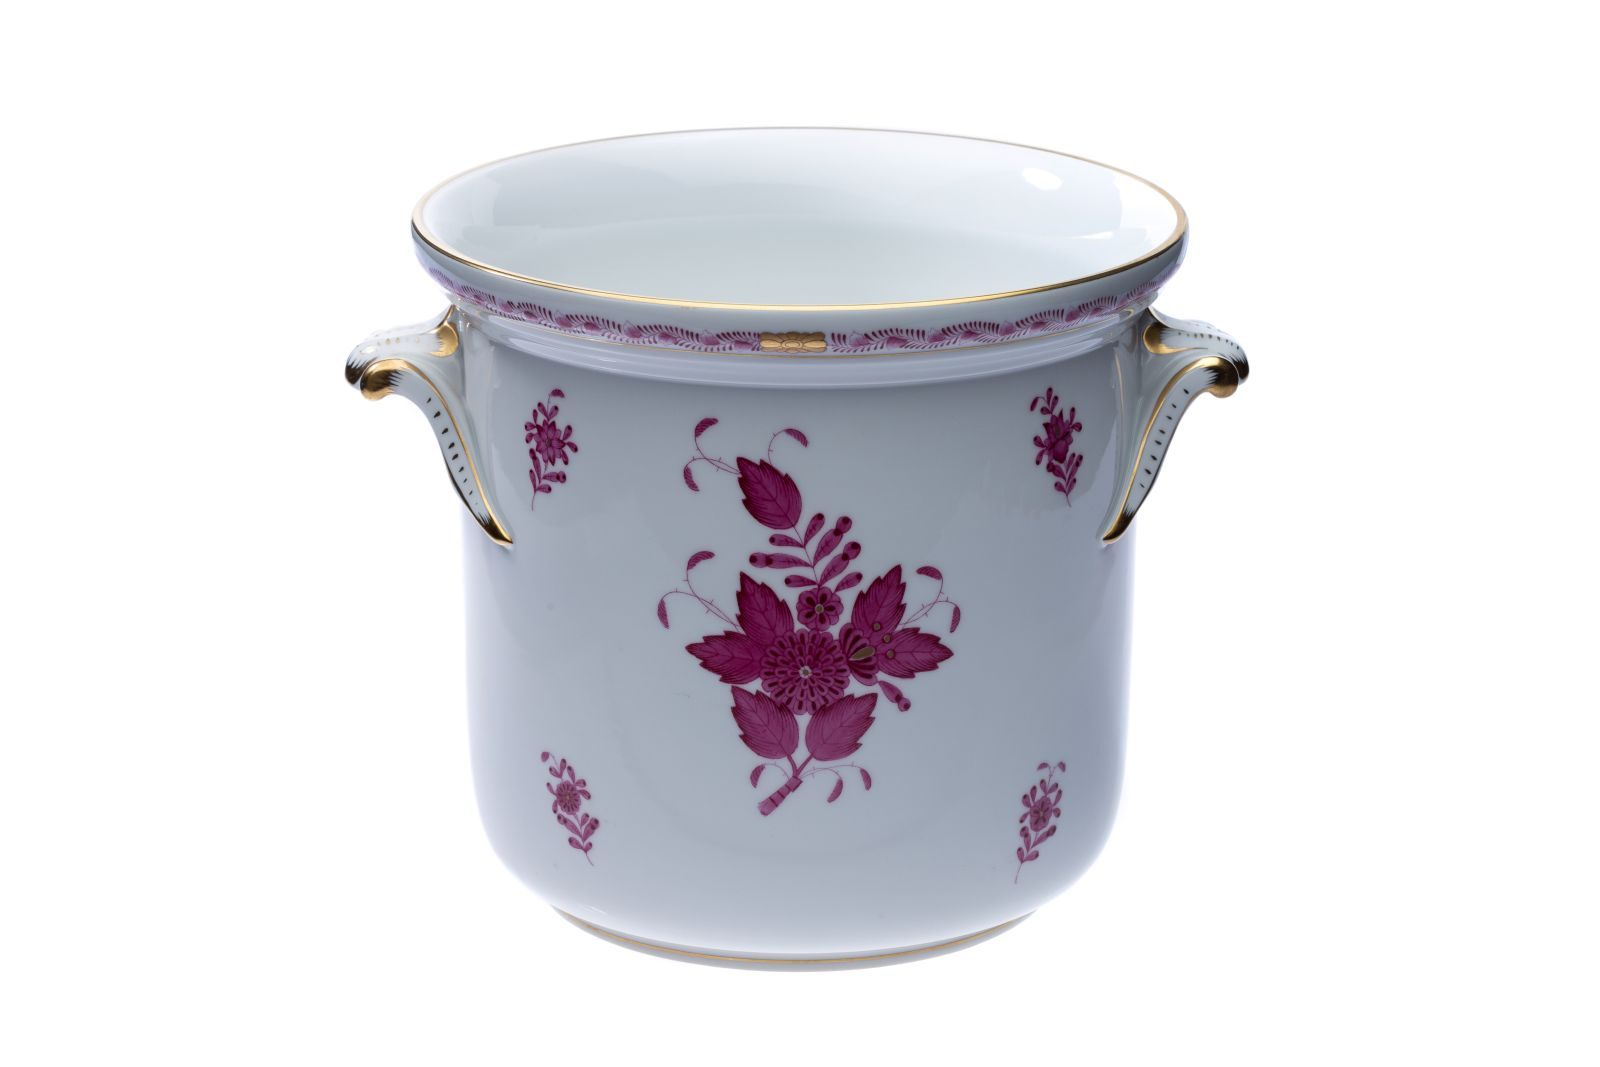 "#12 Herend flowerpot shape Osier decor ""Apponyi purpur"" | Herend Blumentopf Form Osier Dekor ""Apponyi purpur"" Image"